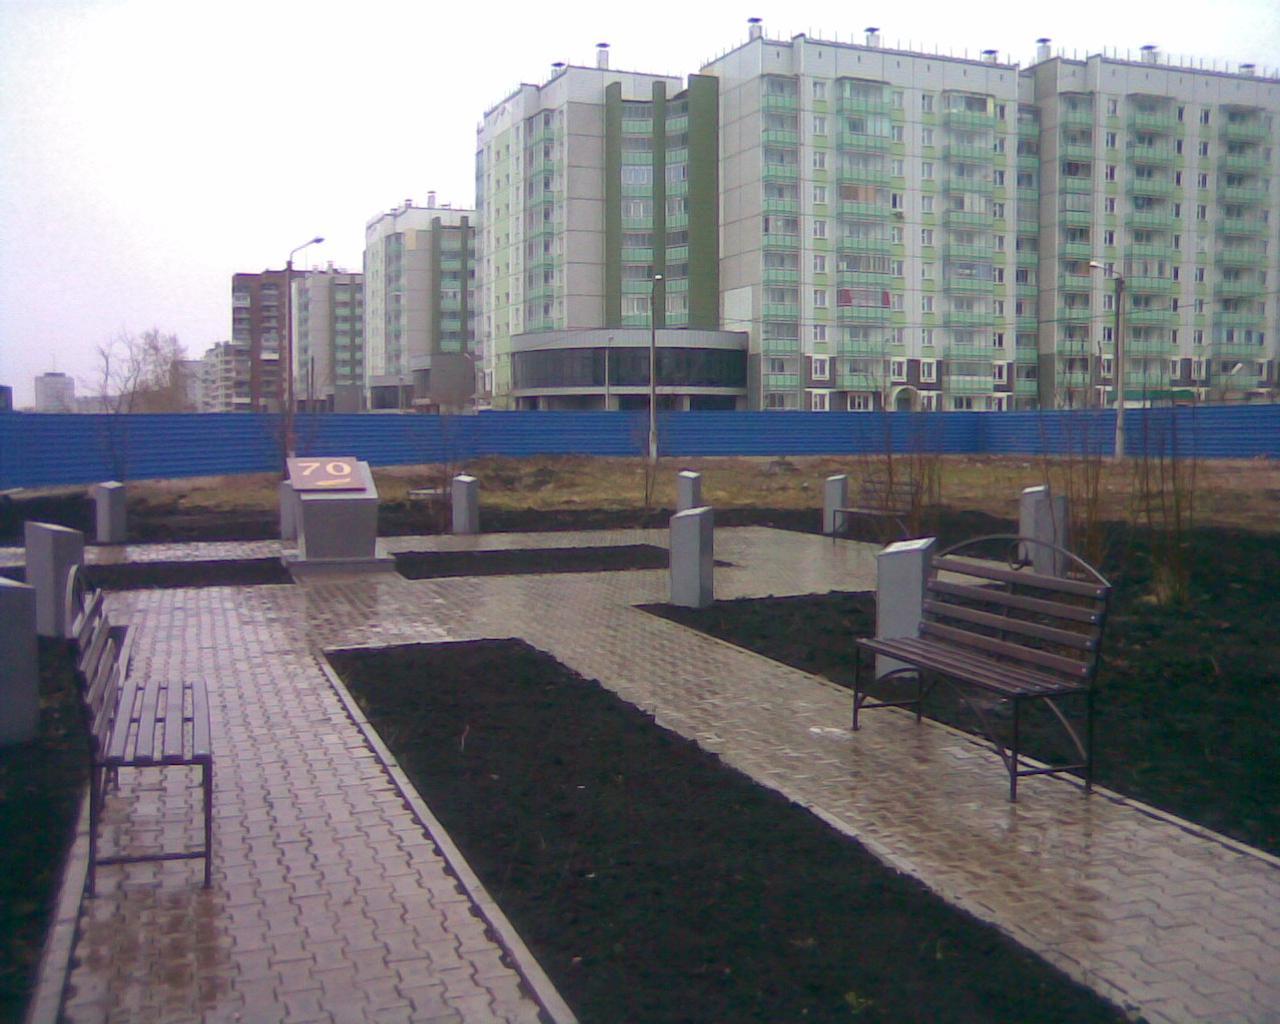 Сквер сотрудникам МЧС